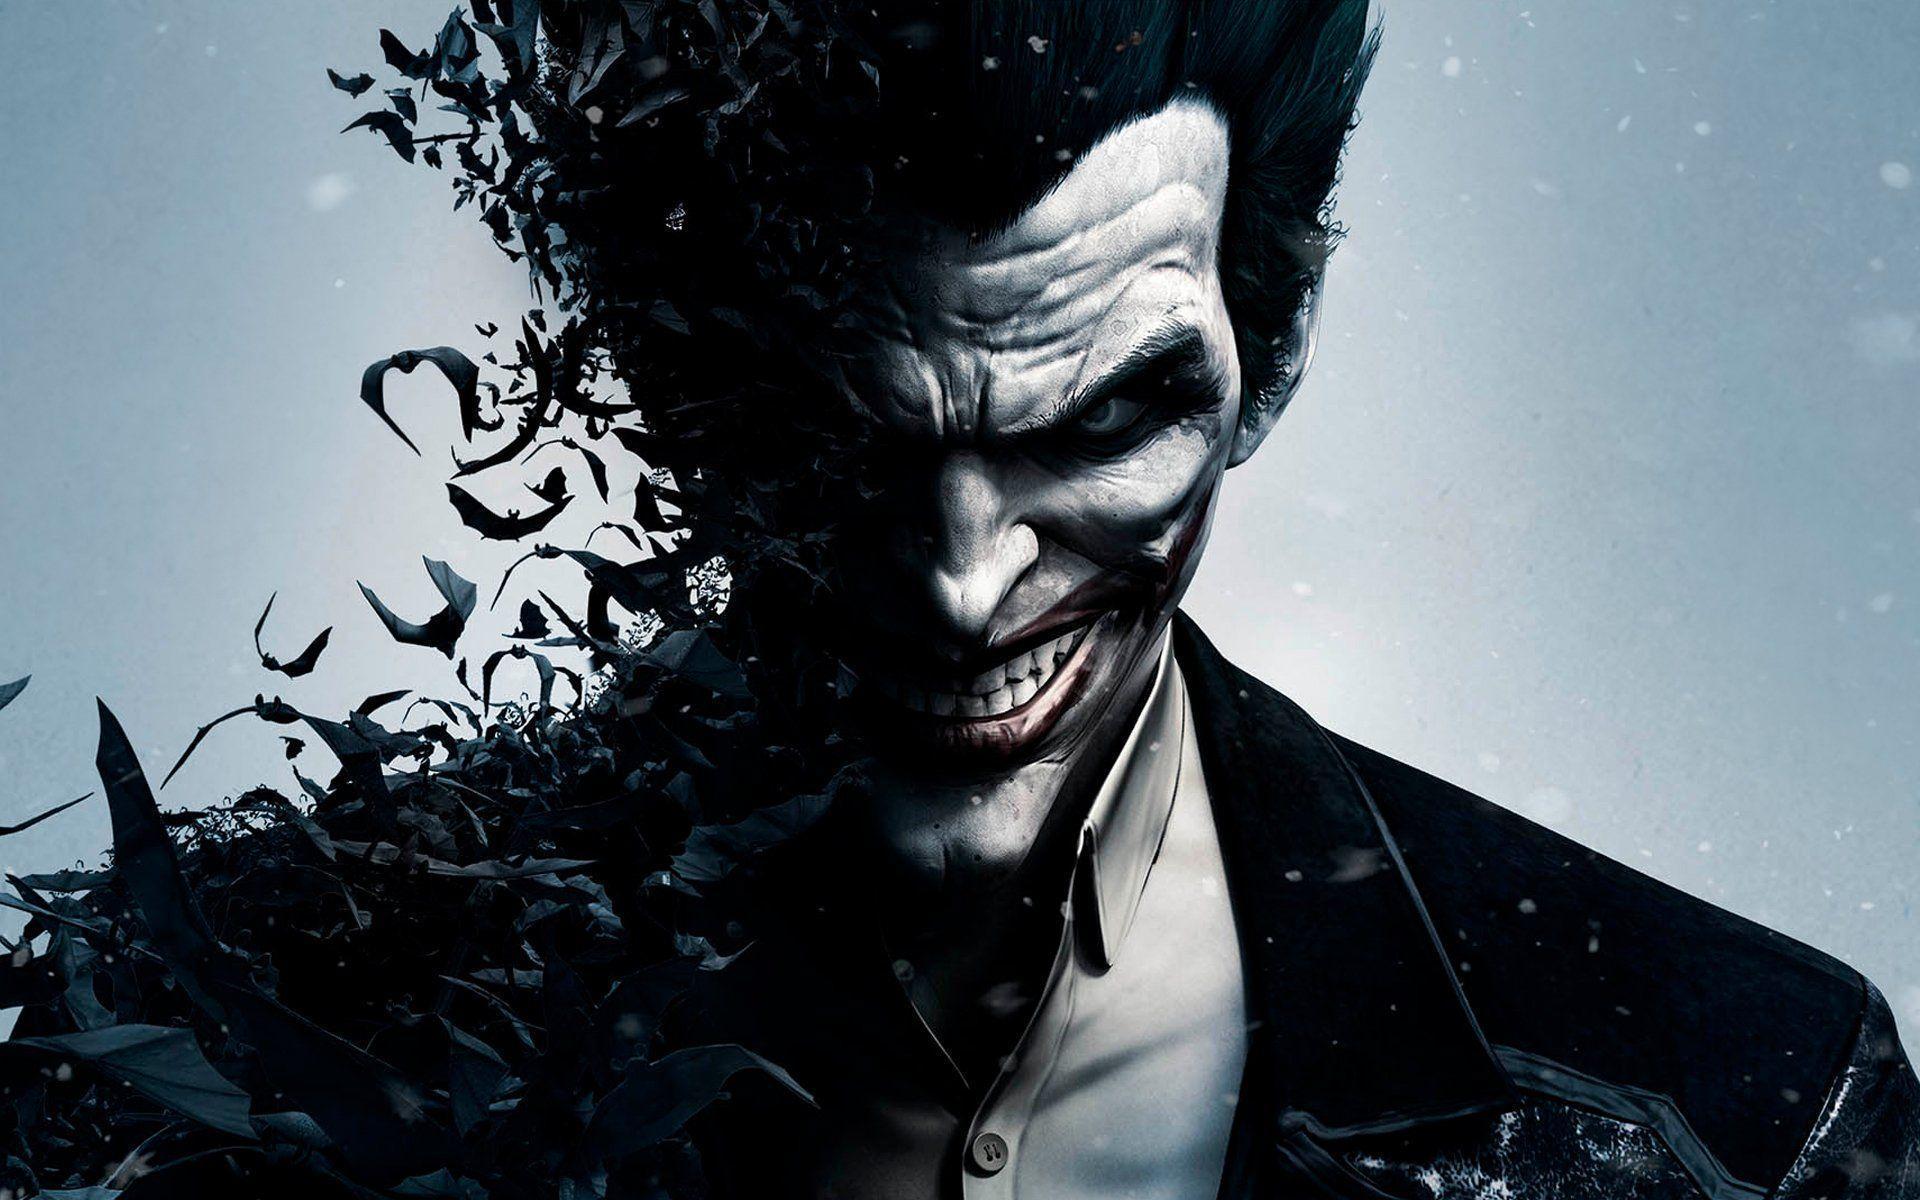 Joker Hd Wallpapers Top Free Joker Hd Backgrounds Wallpaperaccess